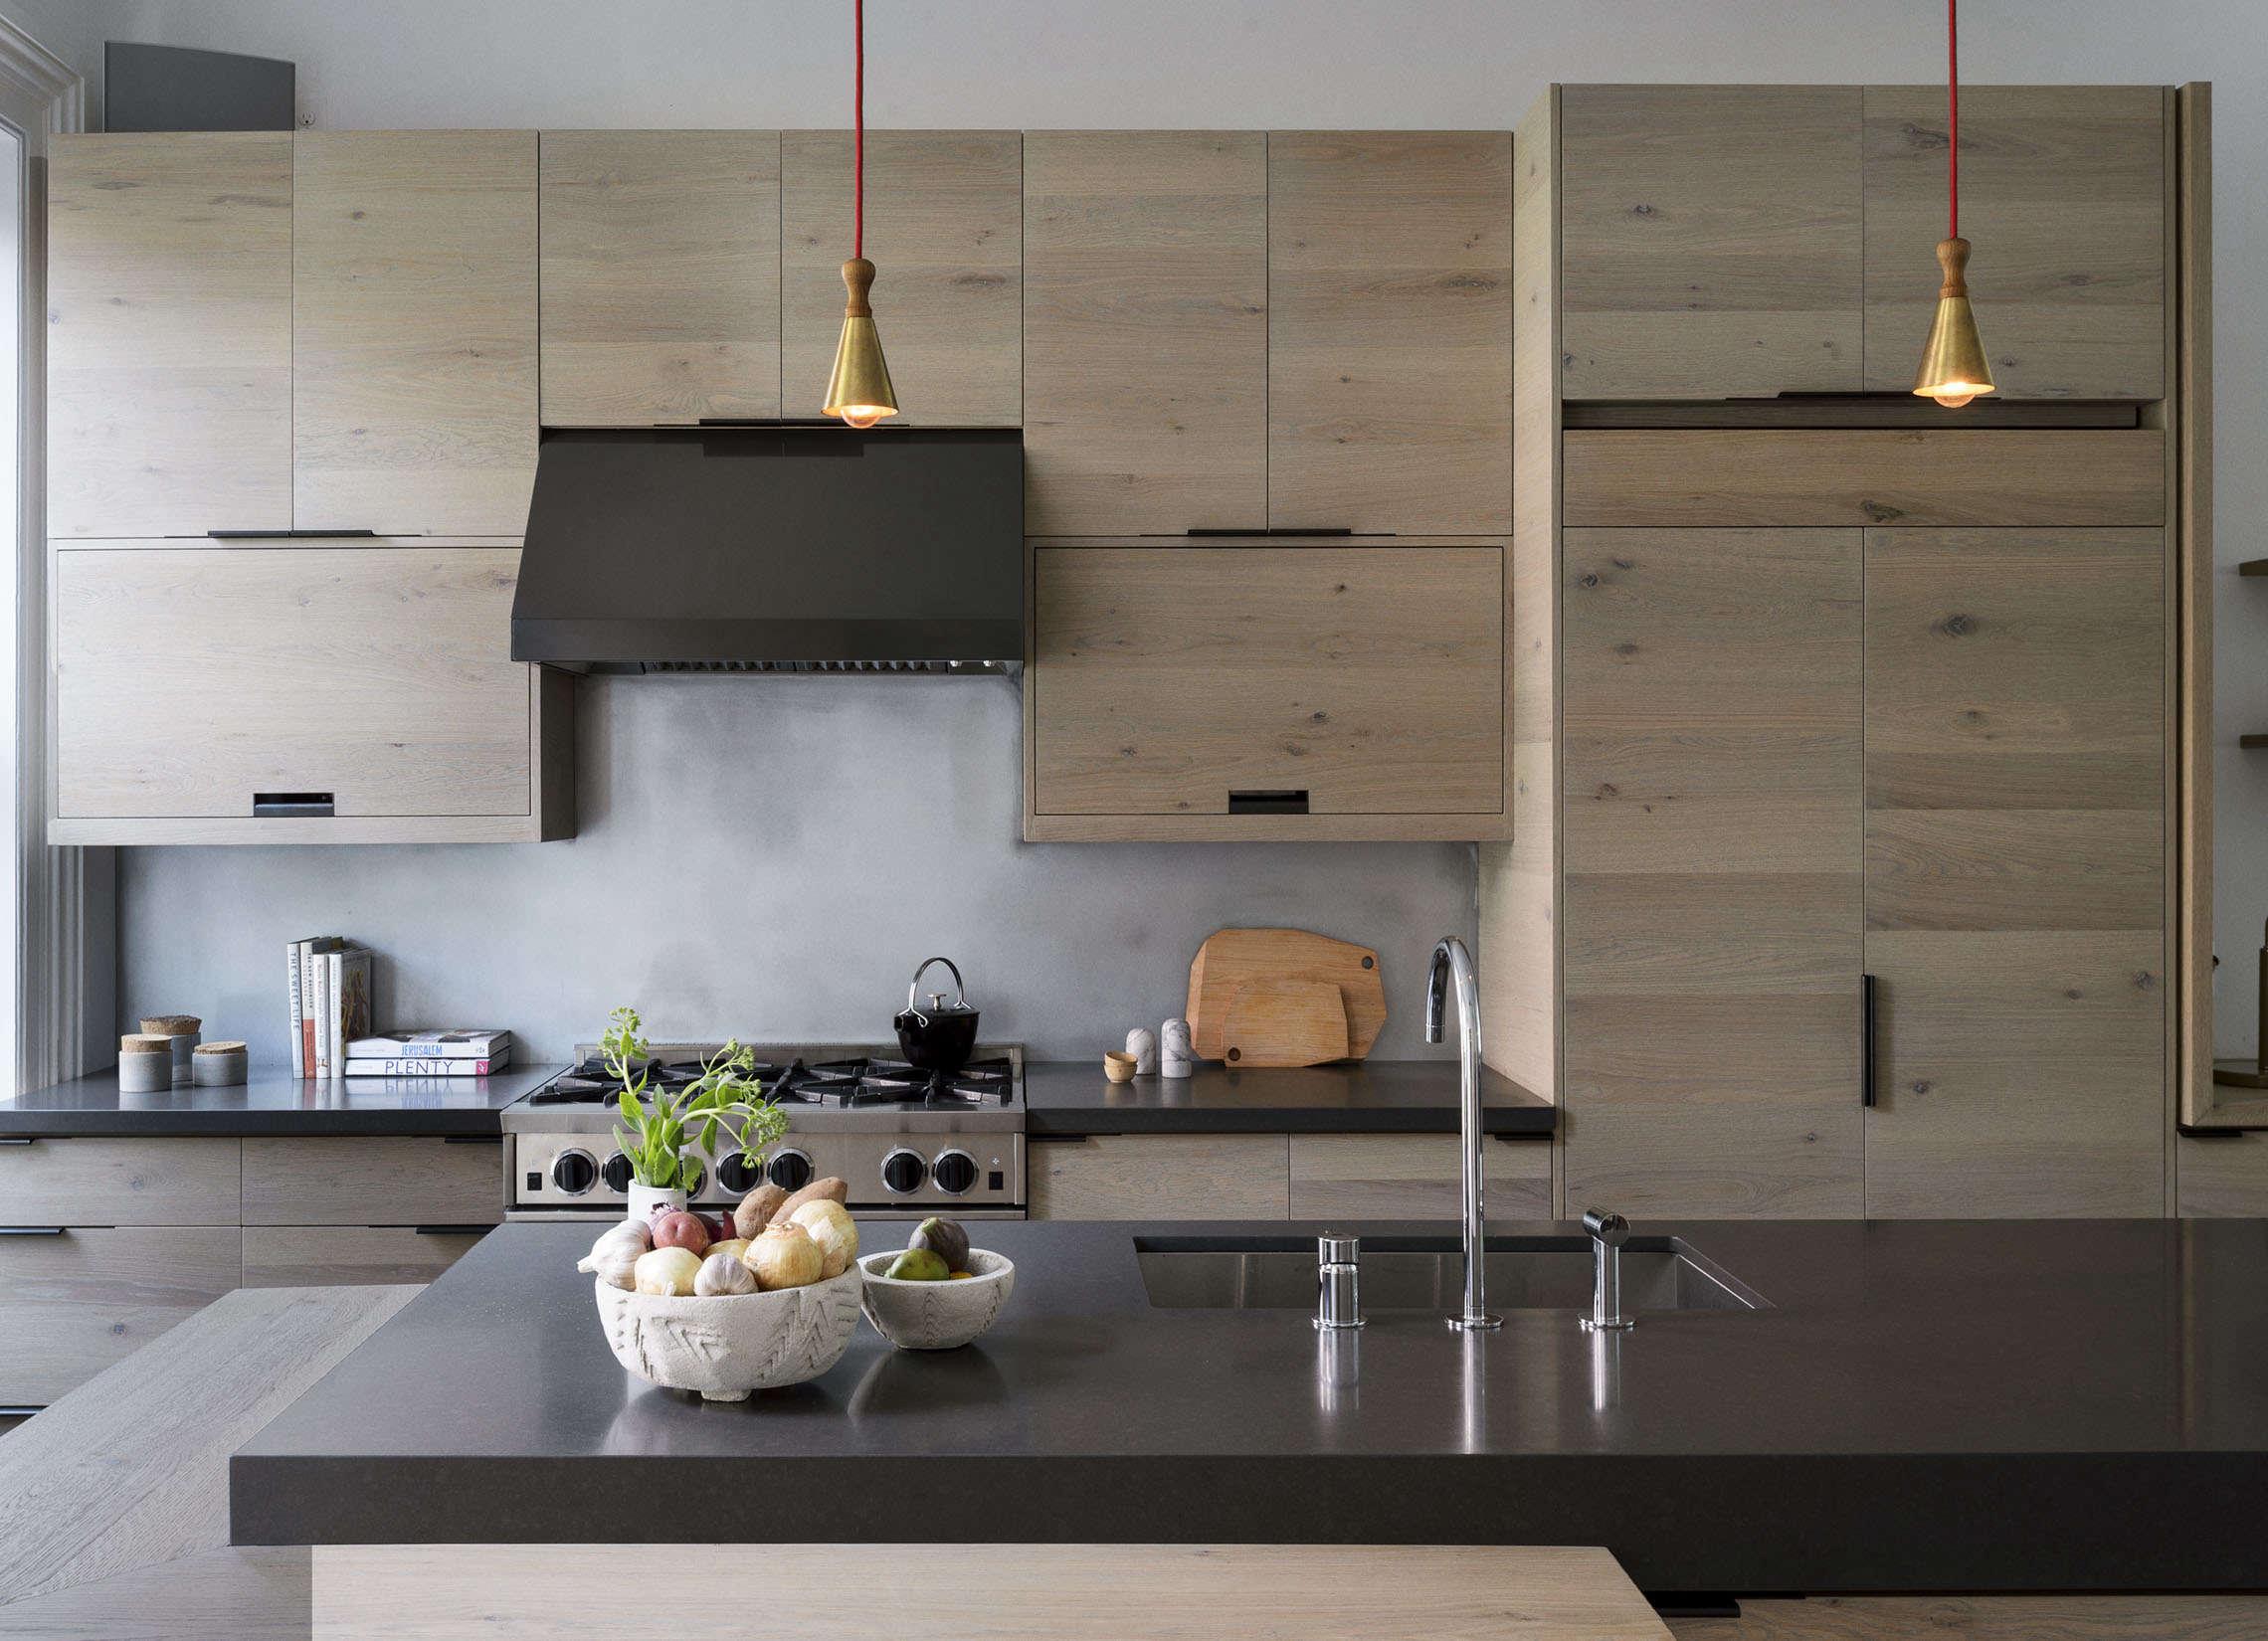 Kitchen of the Week: Masterful Storage in a Workstead Design ...